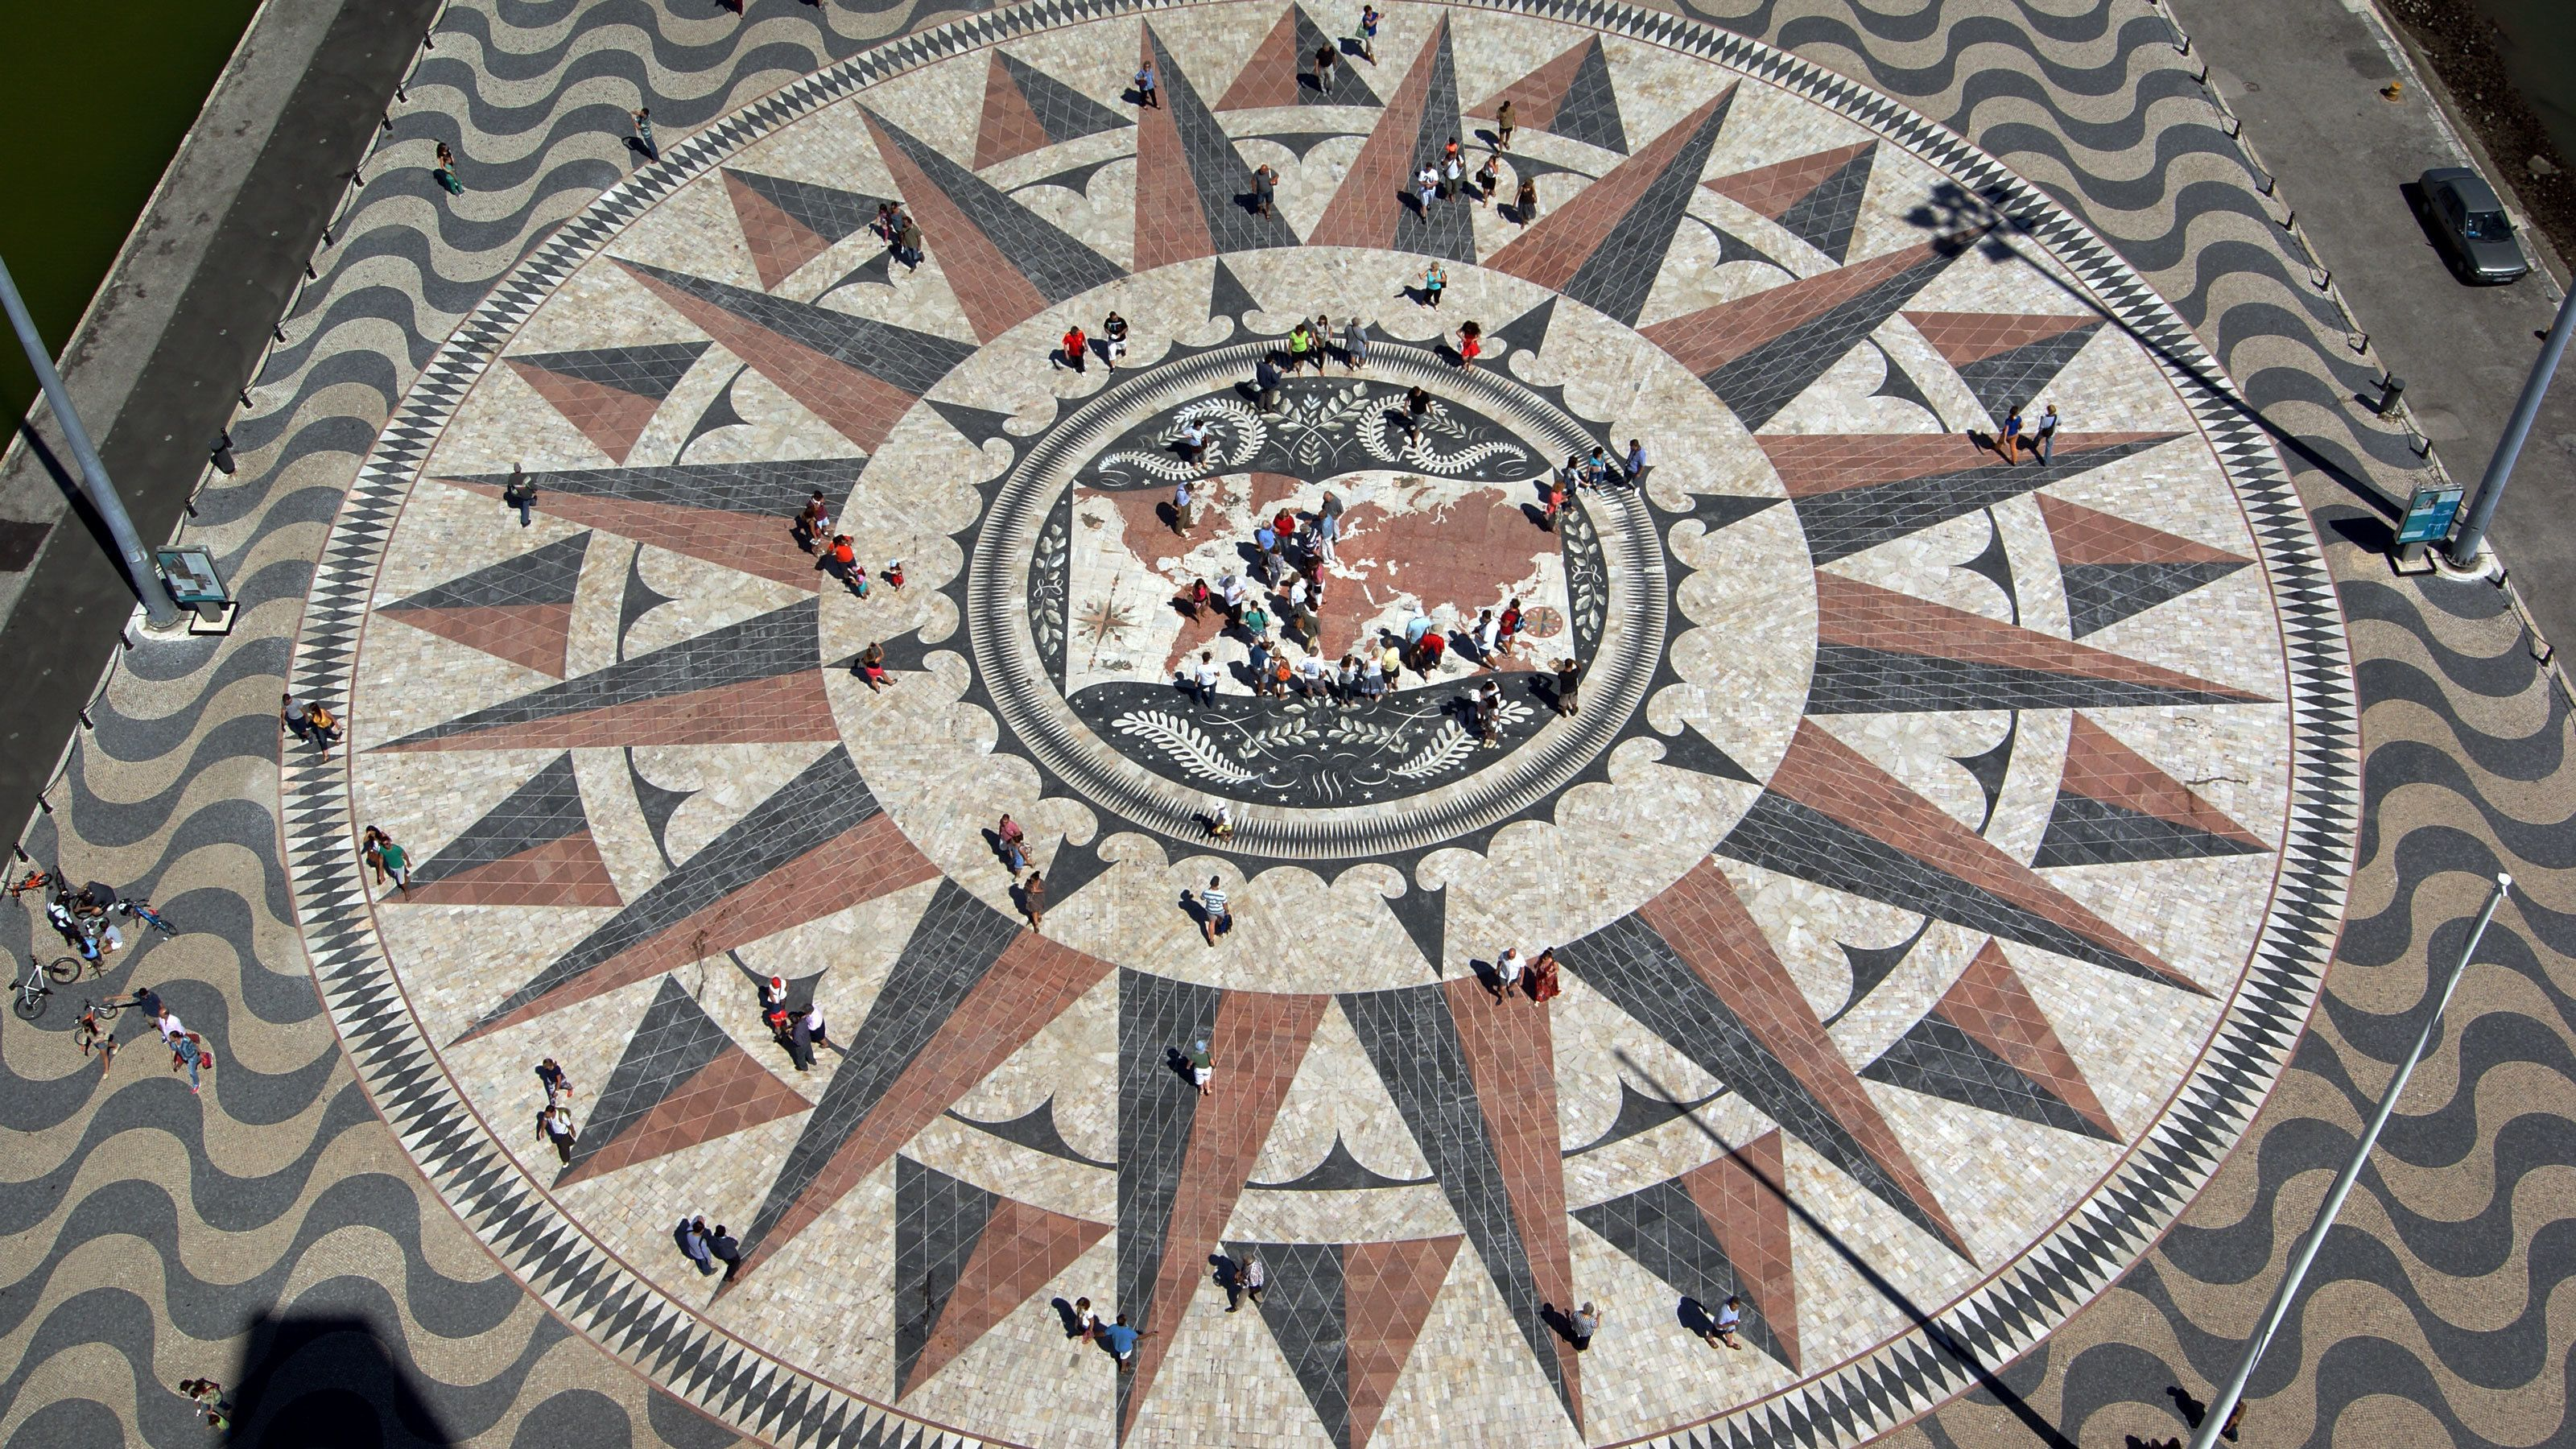 tiled landmark at Padrão dos Descobrimentos in Portugal